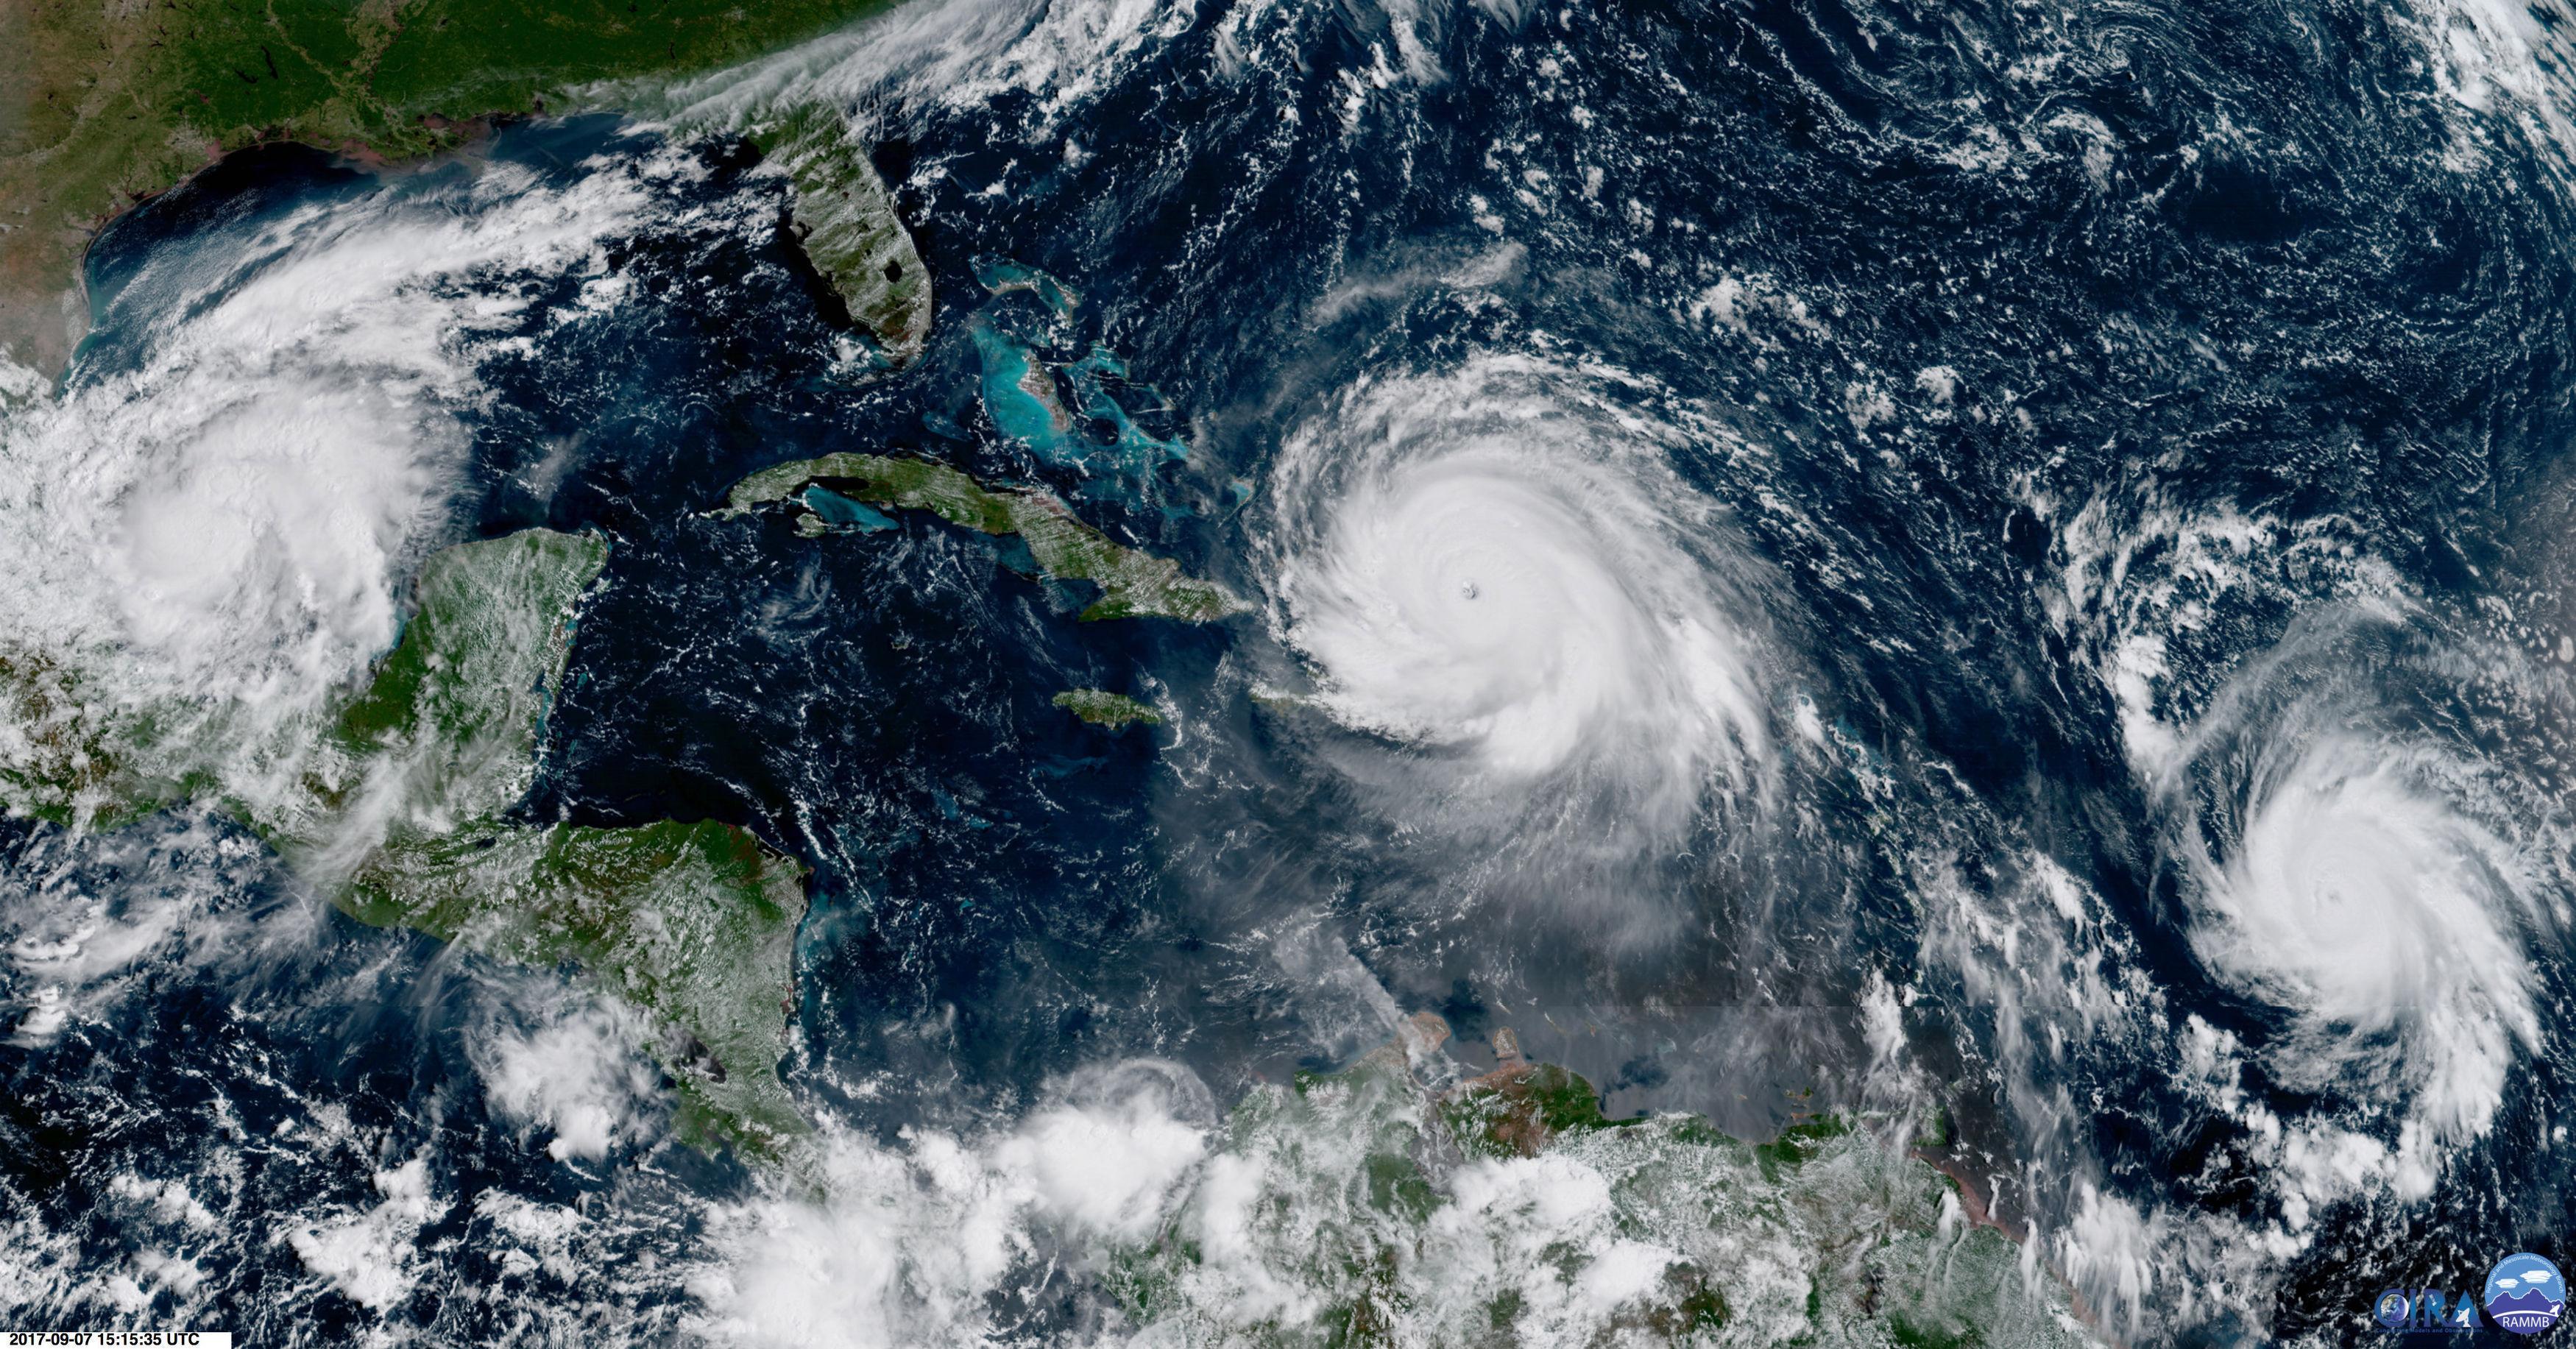 A satellite image of Hurricane Irma.